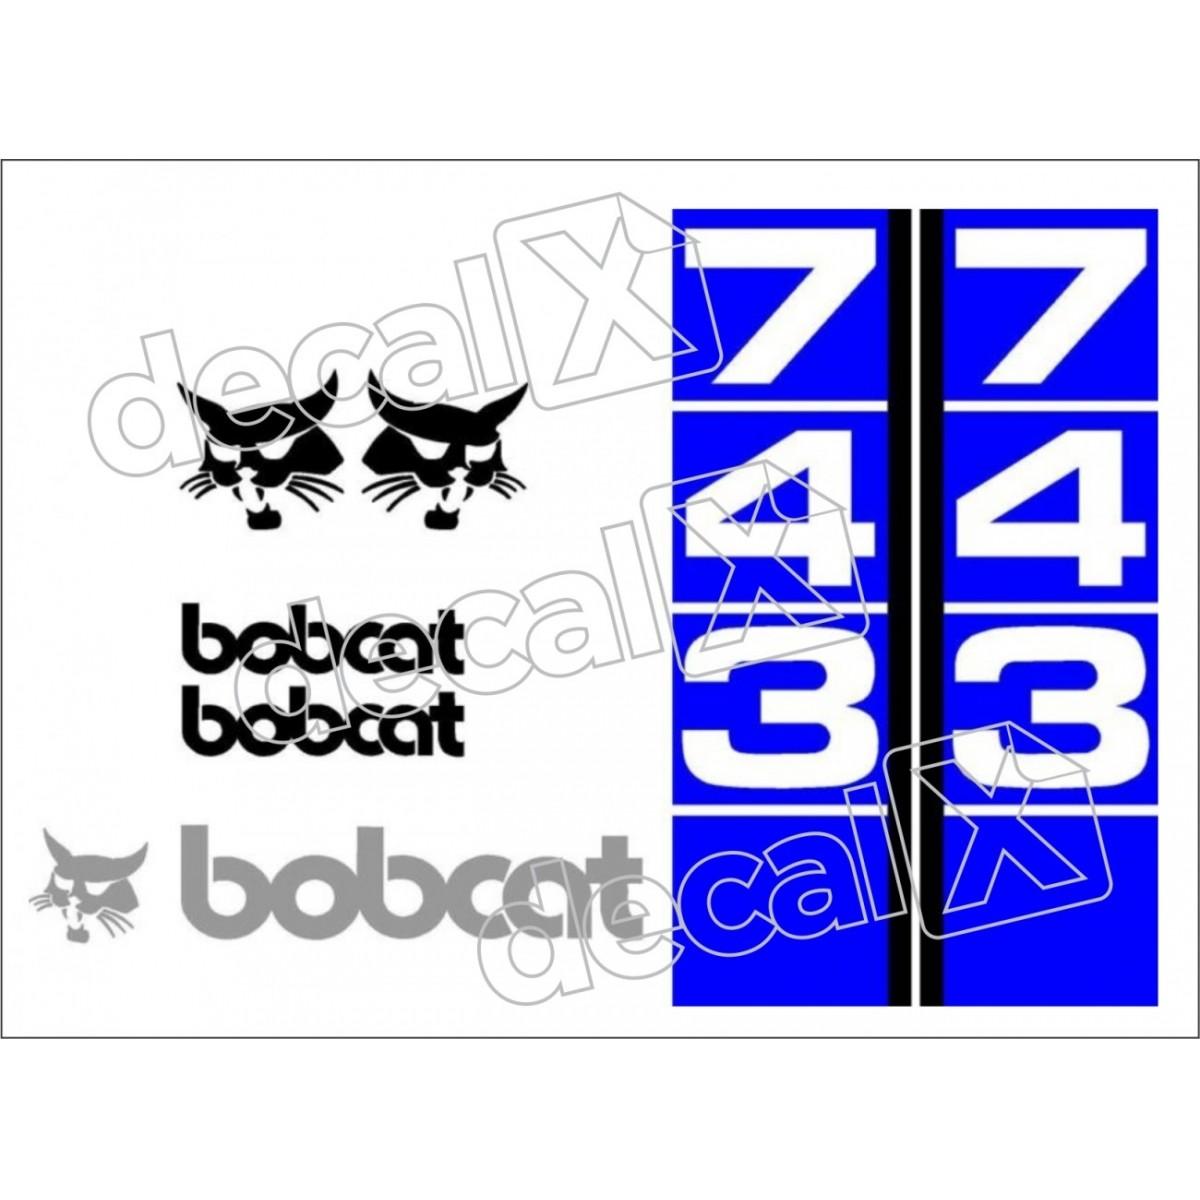 Kit Adesivos Bobcat 743 Decalx